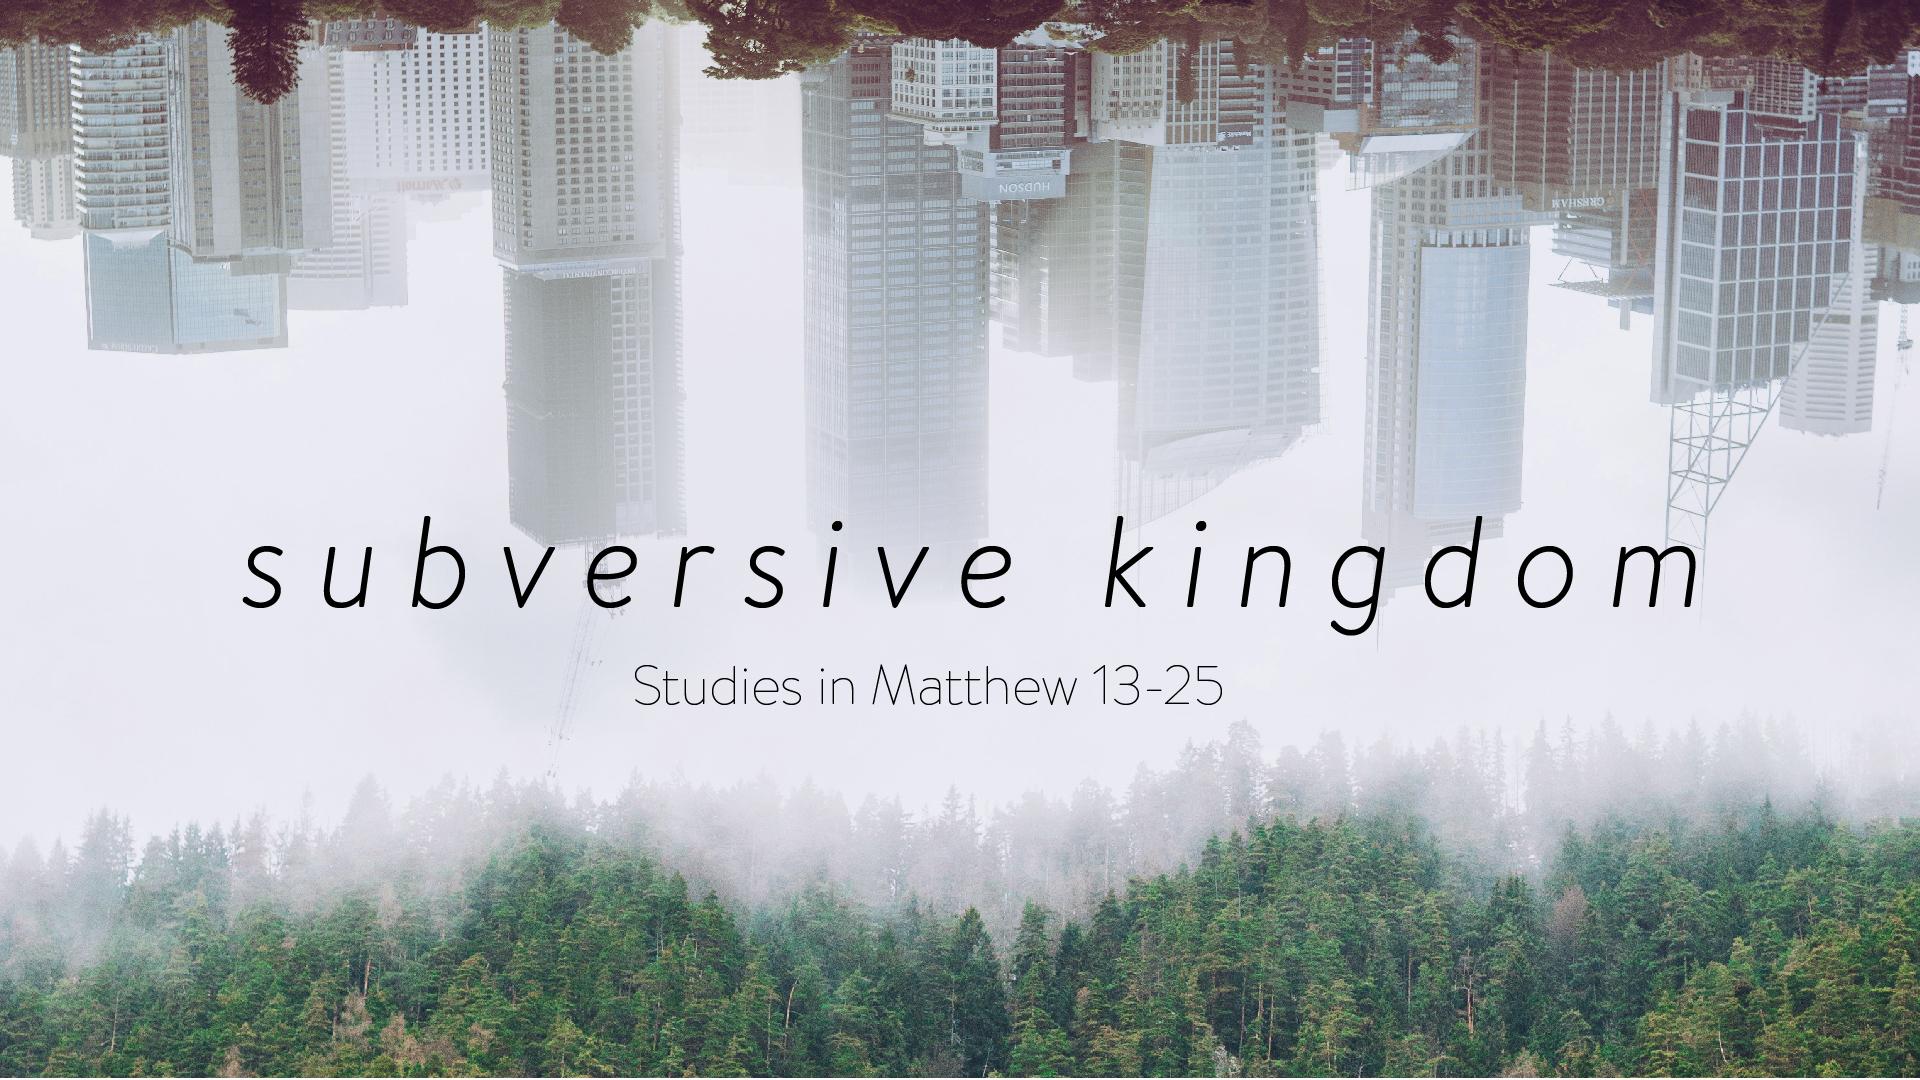 Subversive Kingdom